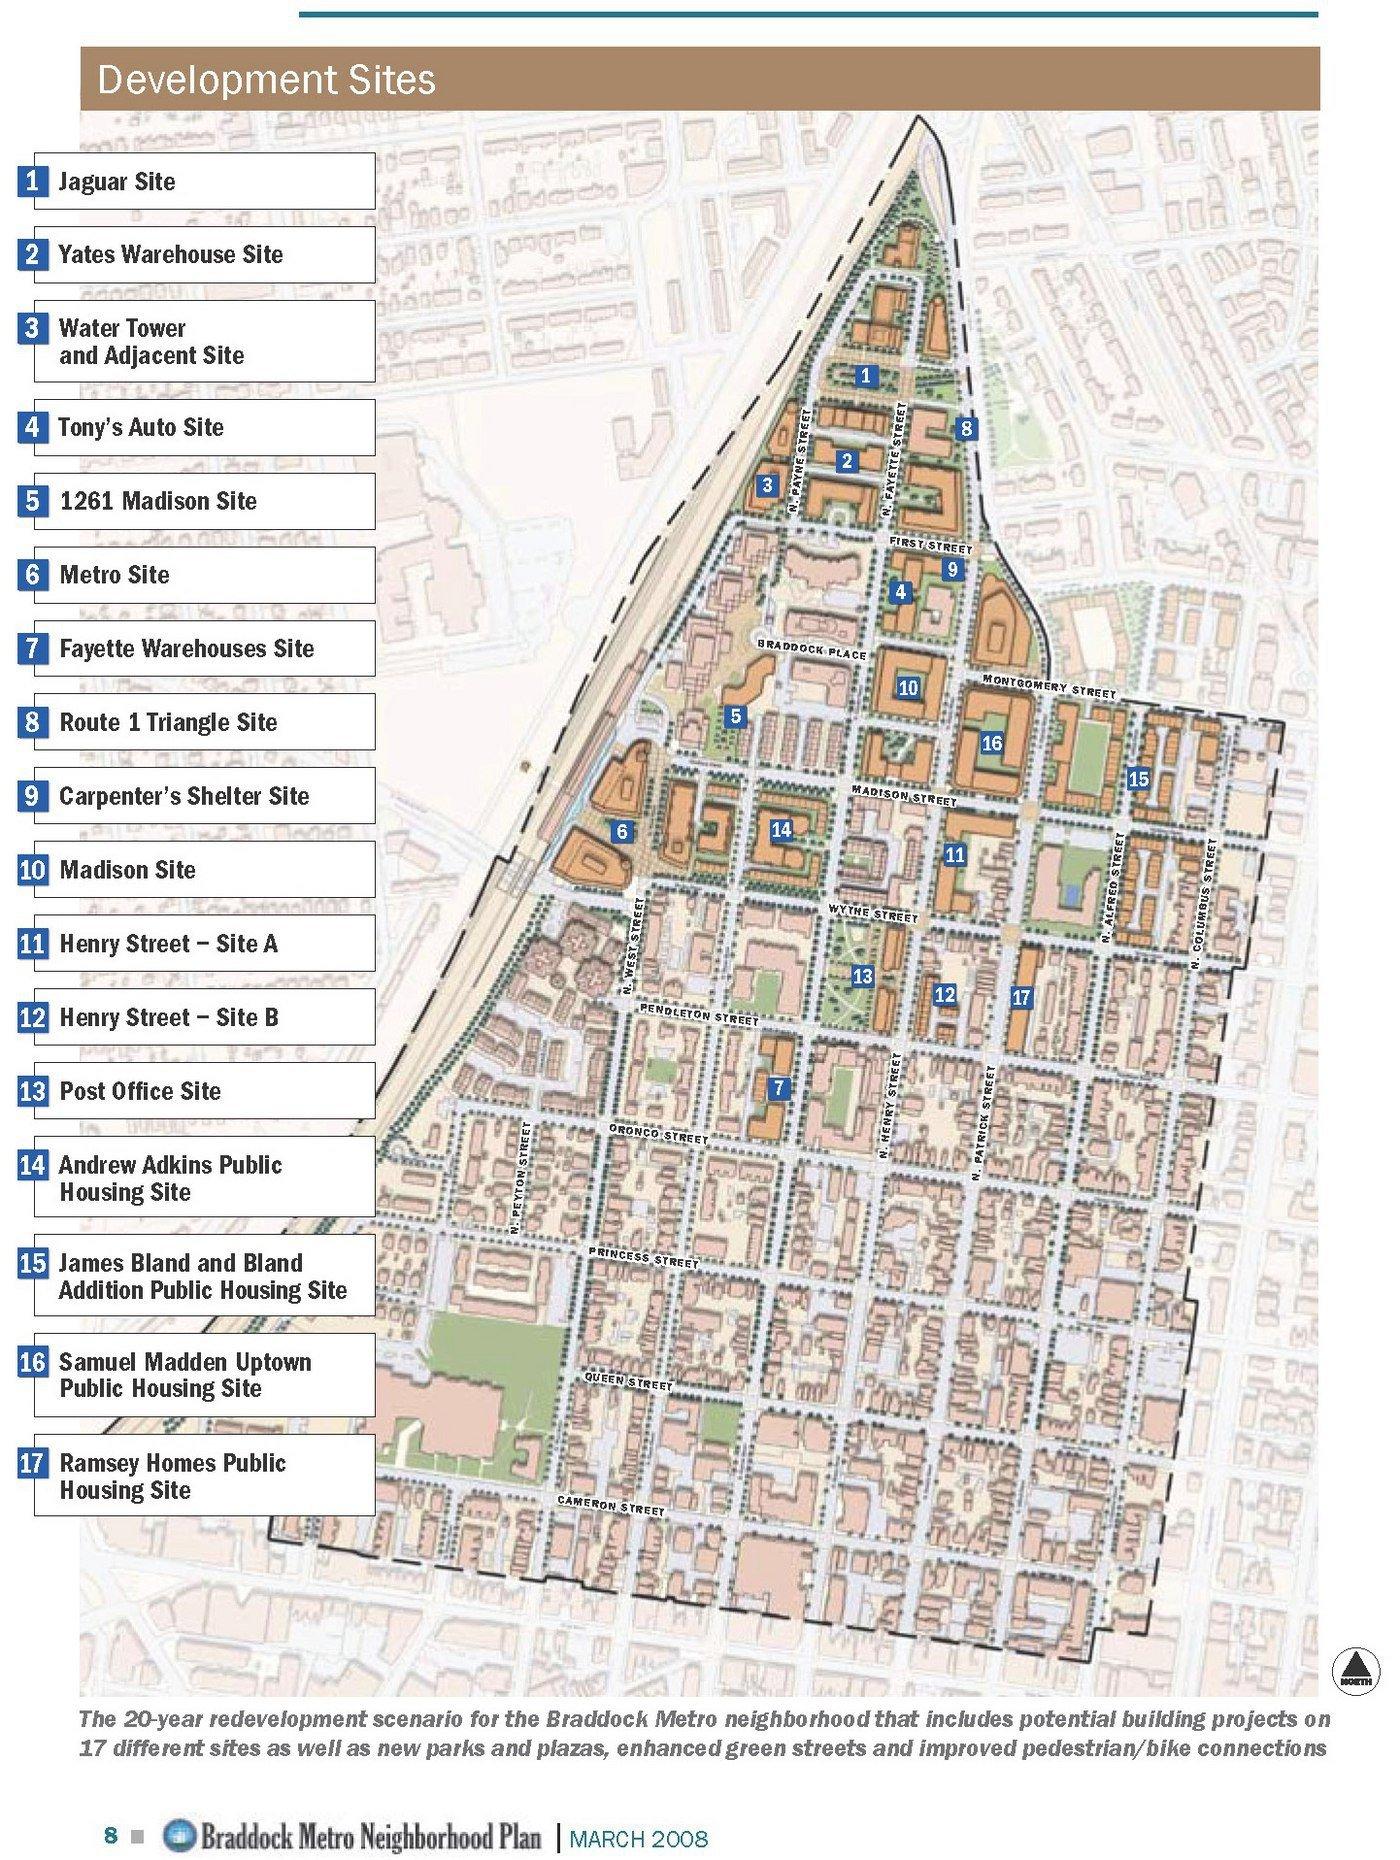 17 Development Projects for Braddock Metro Area